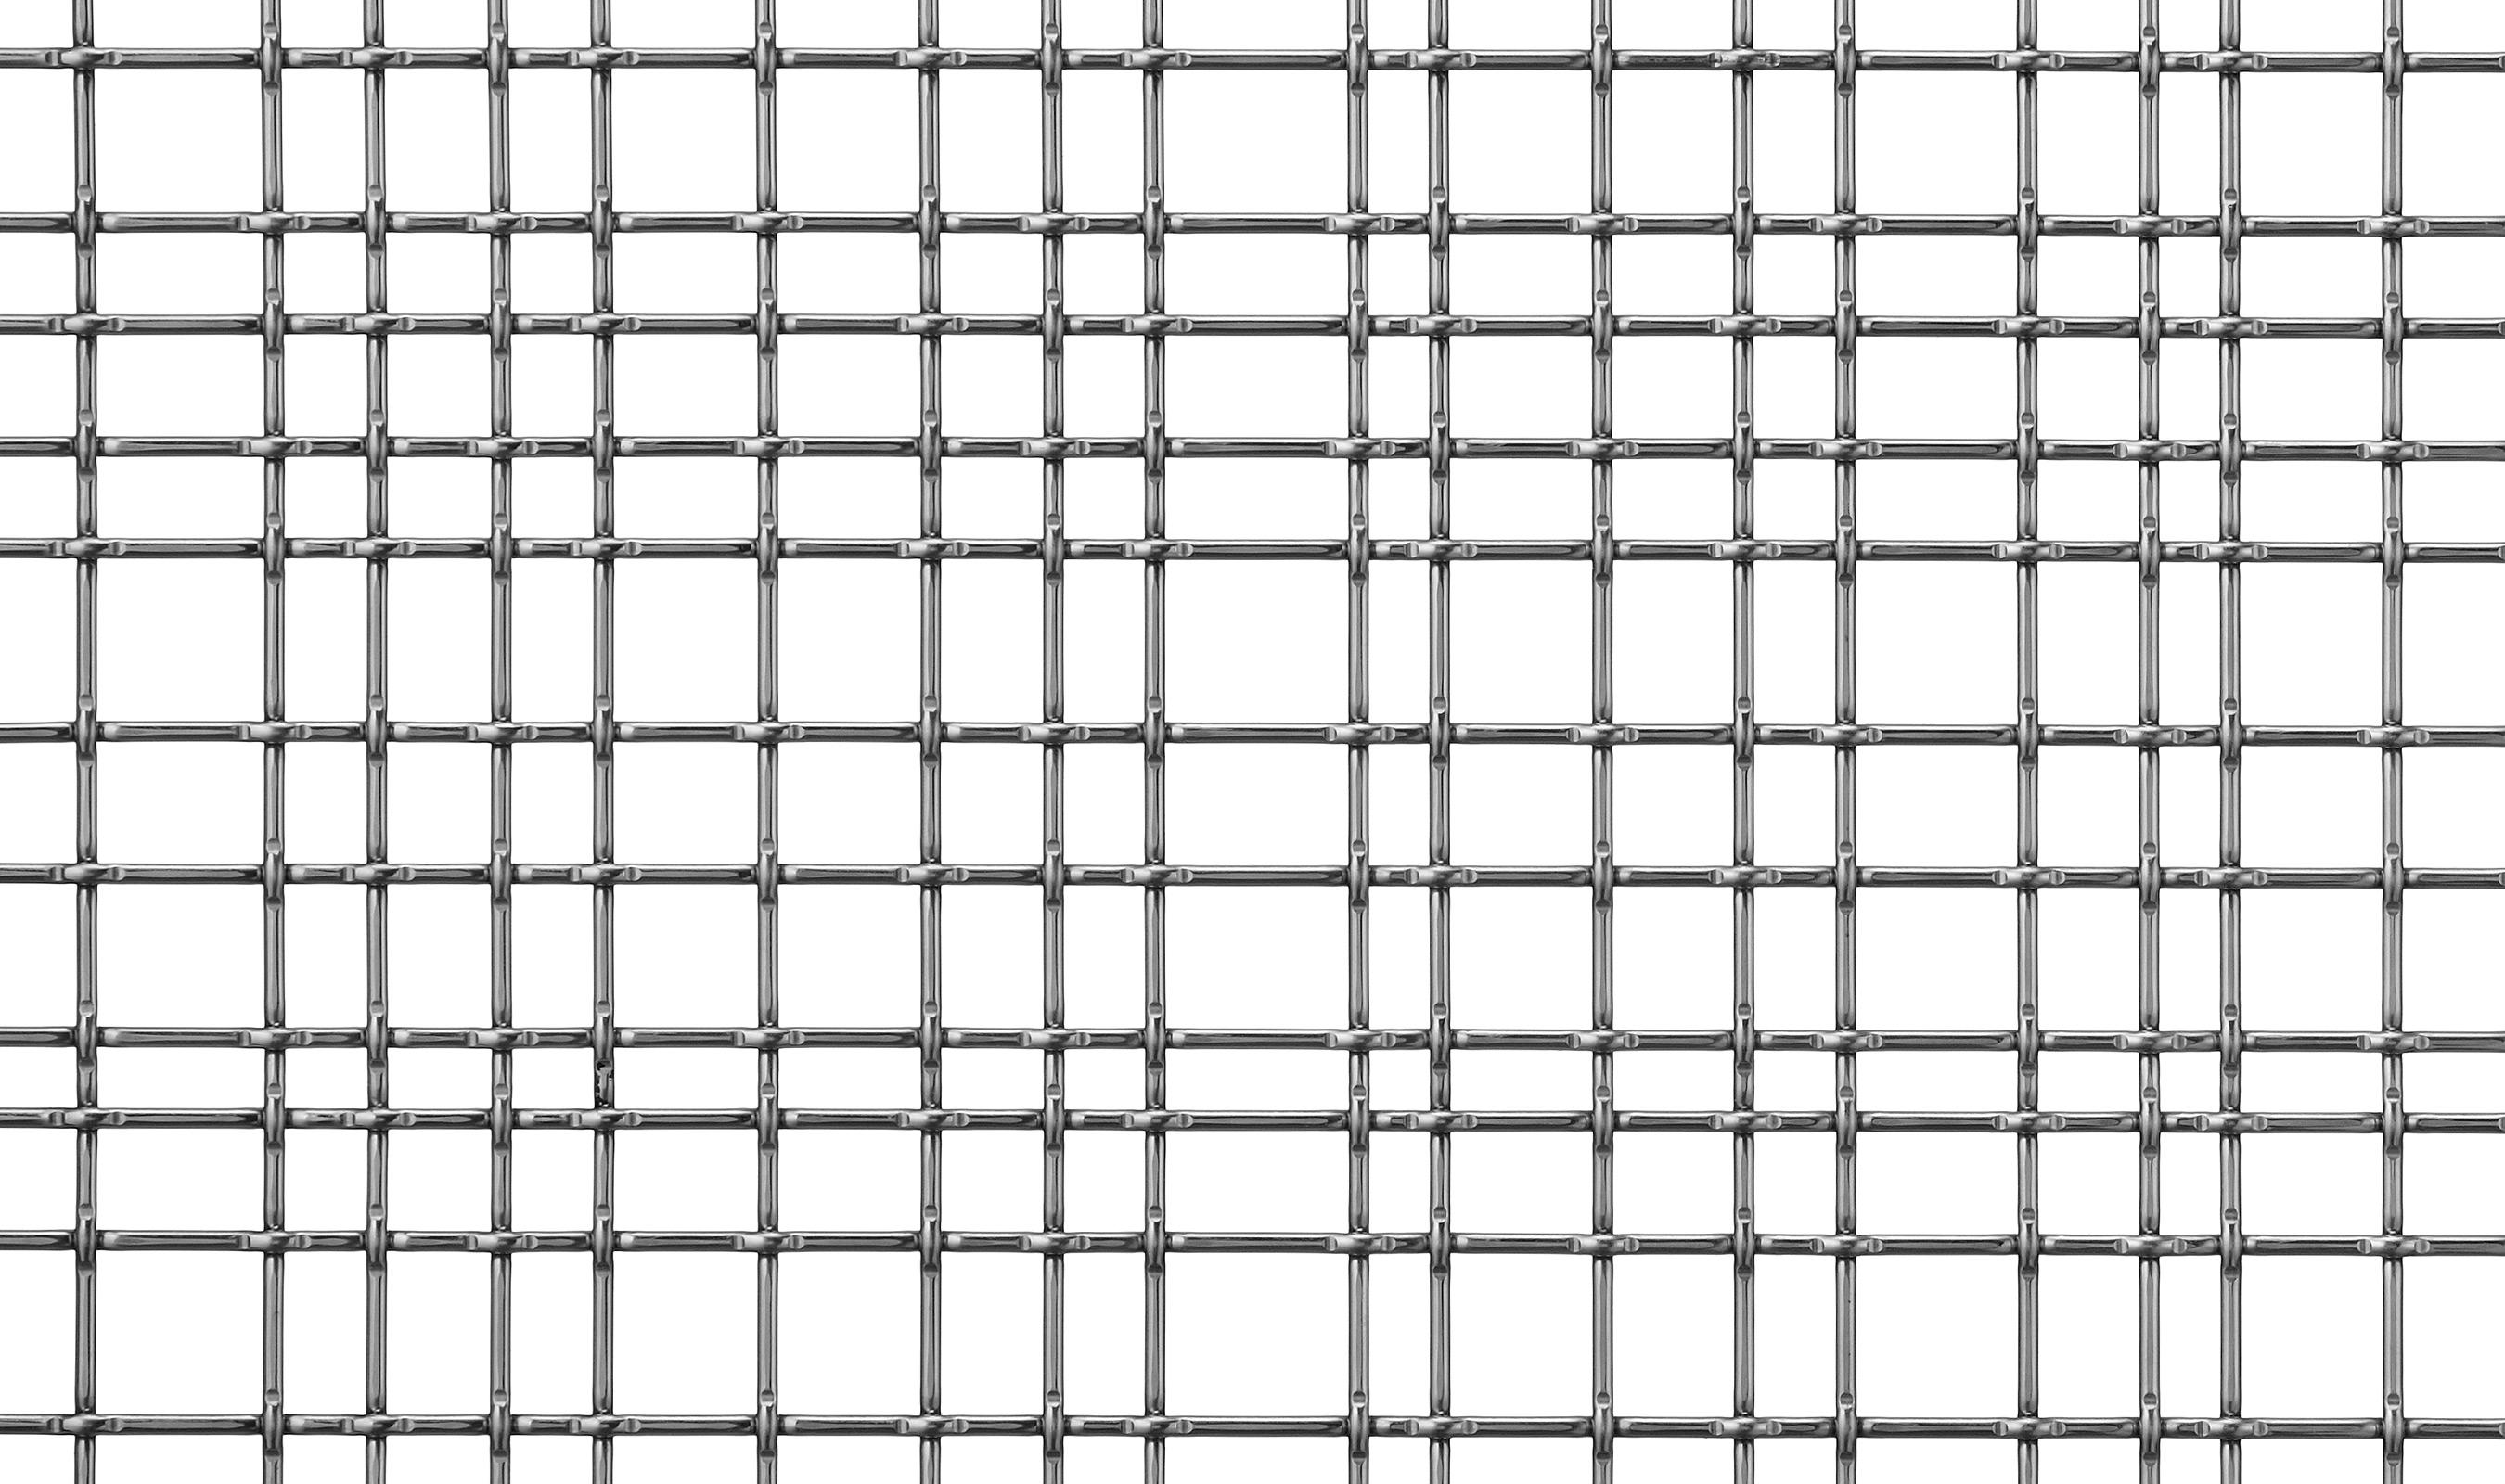 SJD-2 architectural woven wire mesh